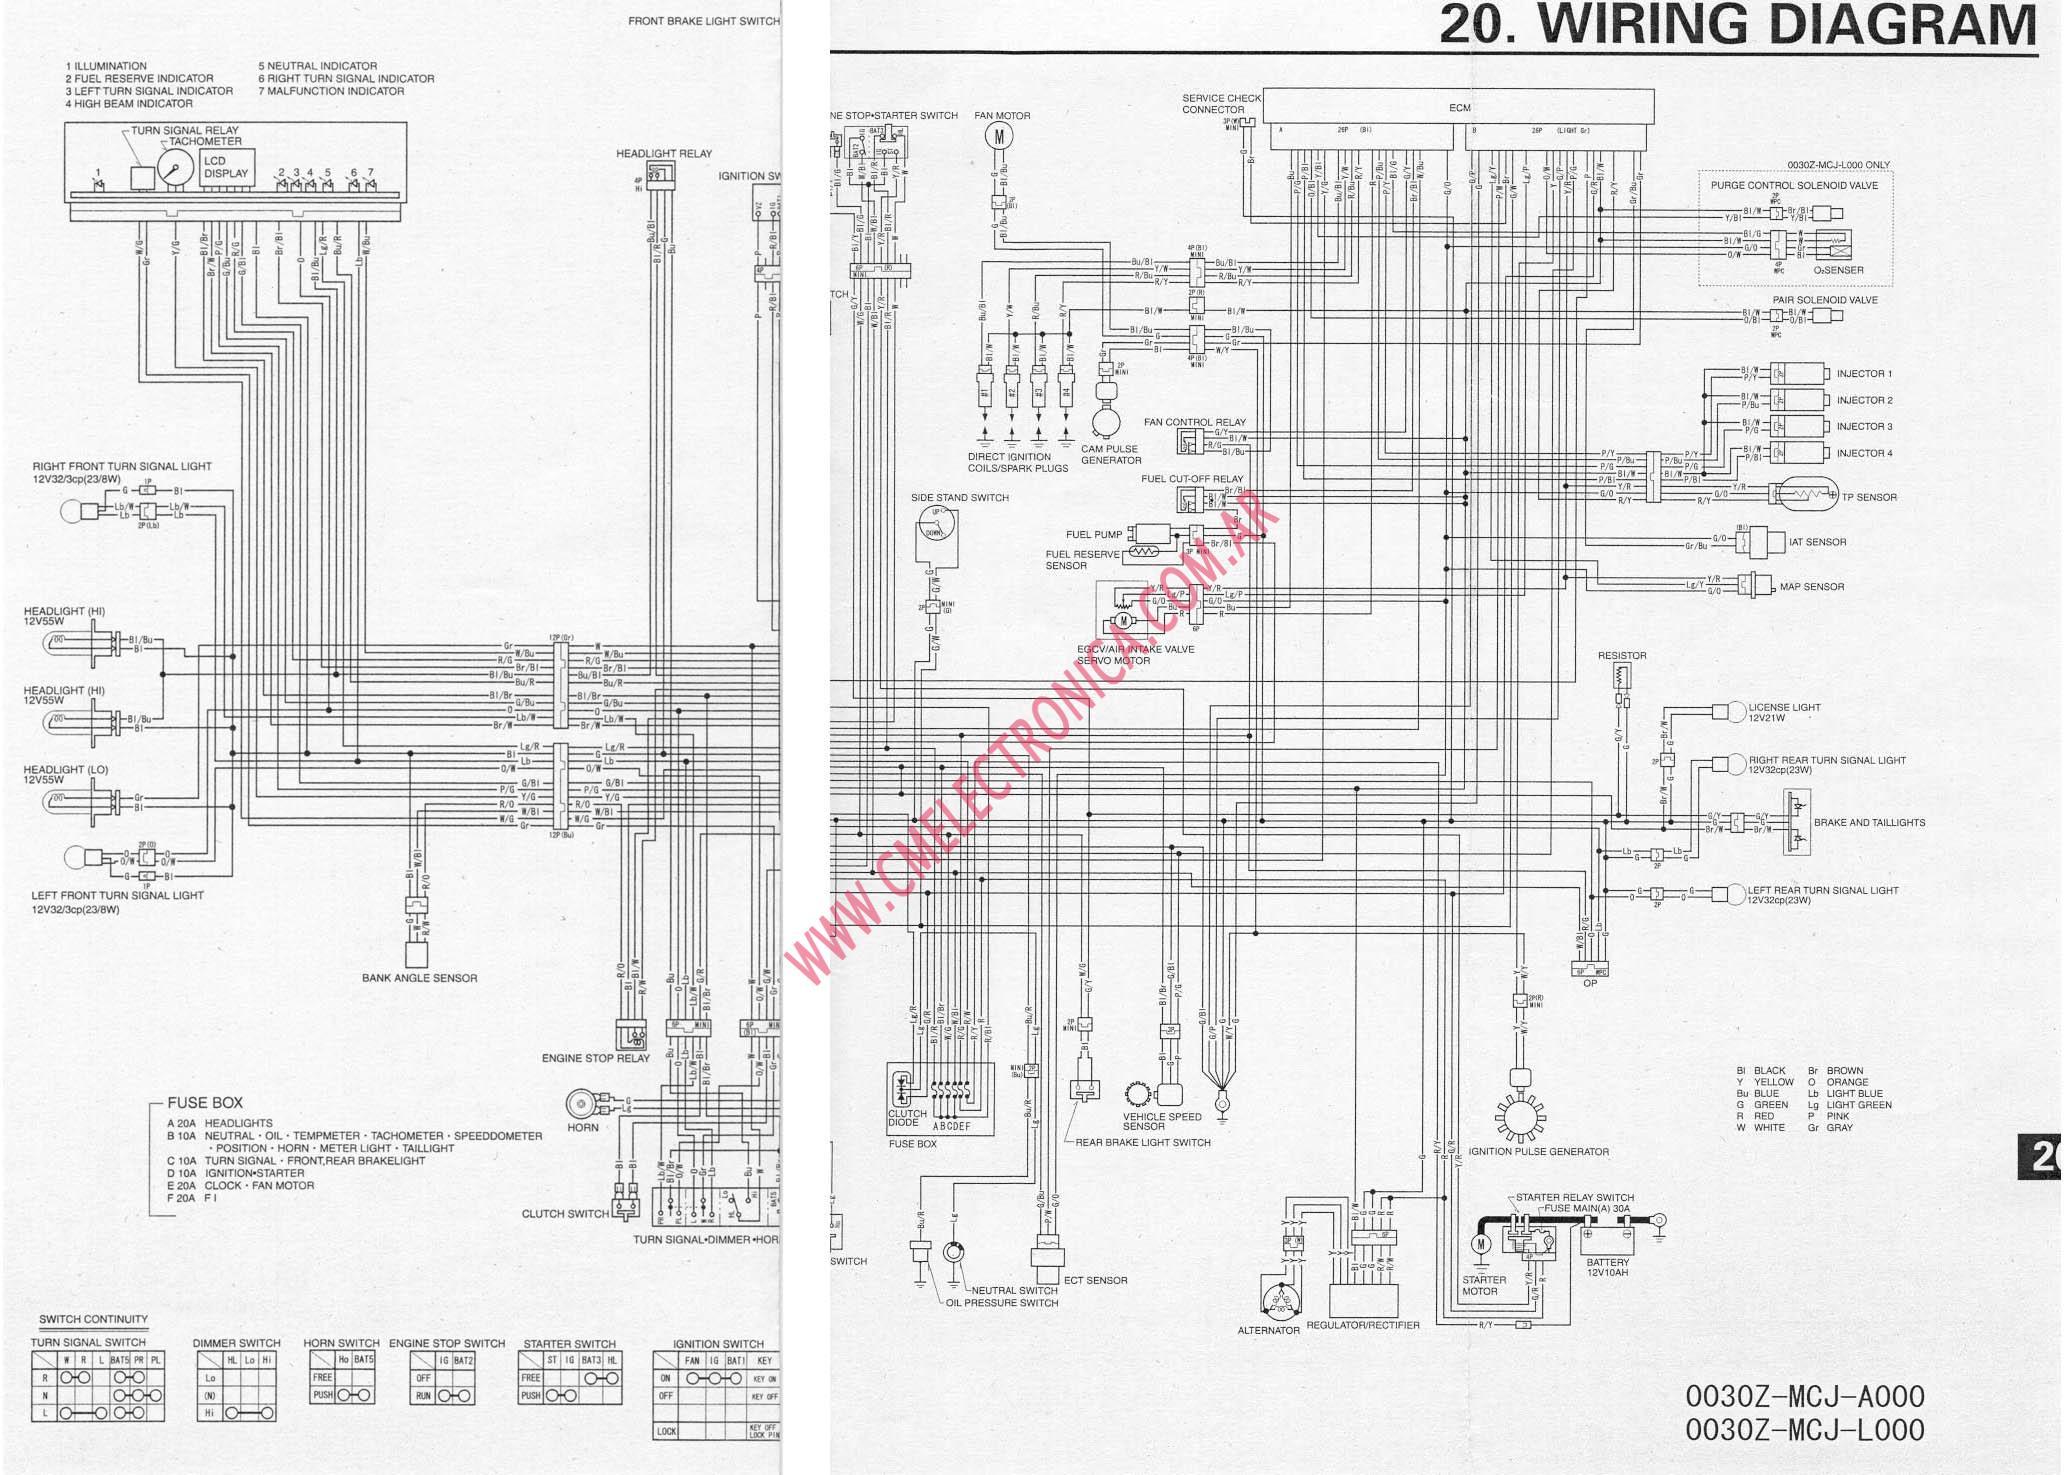 [DIAGRAM_3US]  HR_5699] 96 Honda Cbr 600 Wiring Diagram Download Diagram   96 Honda Cbr 600 F3 Wiring Diagram      Inama Eopsy Ynthe Arivo Bepta Mohammedshrine Librar Wiring 101